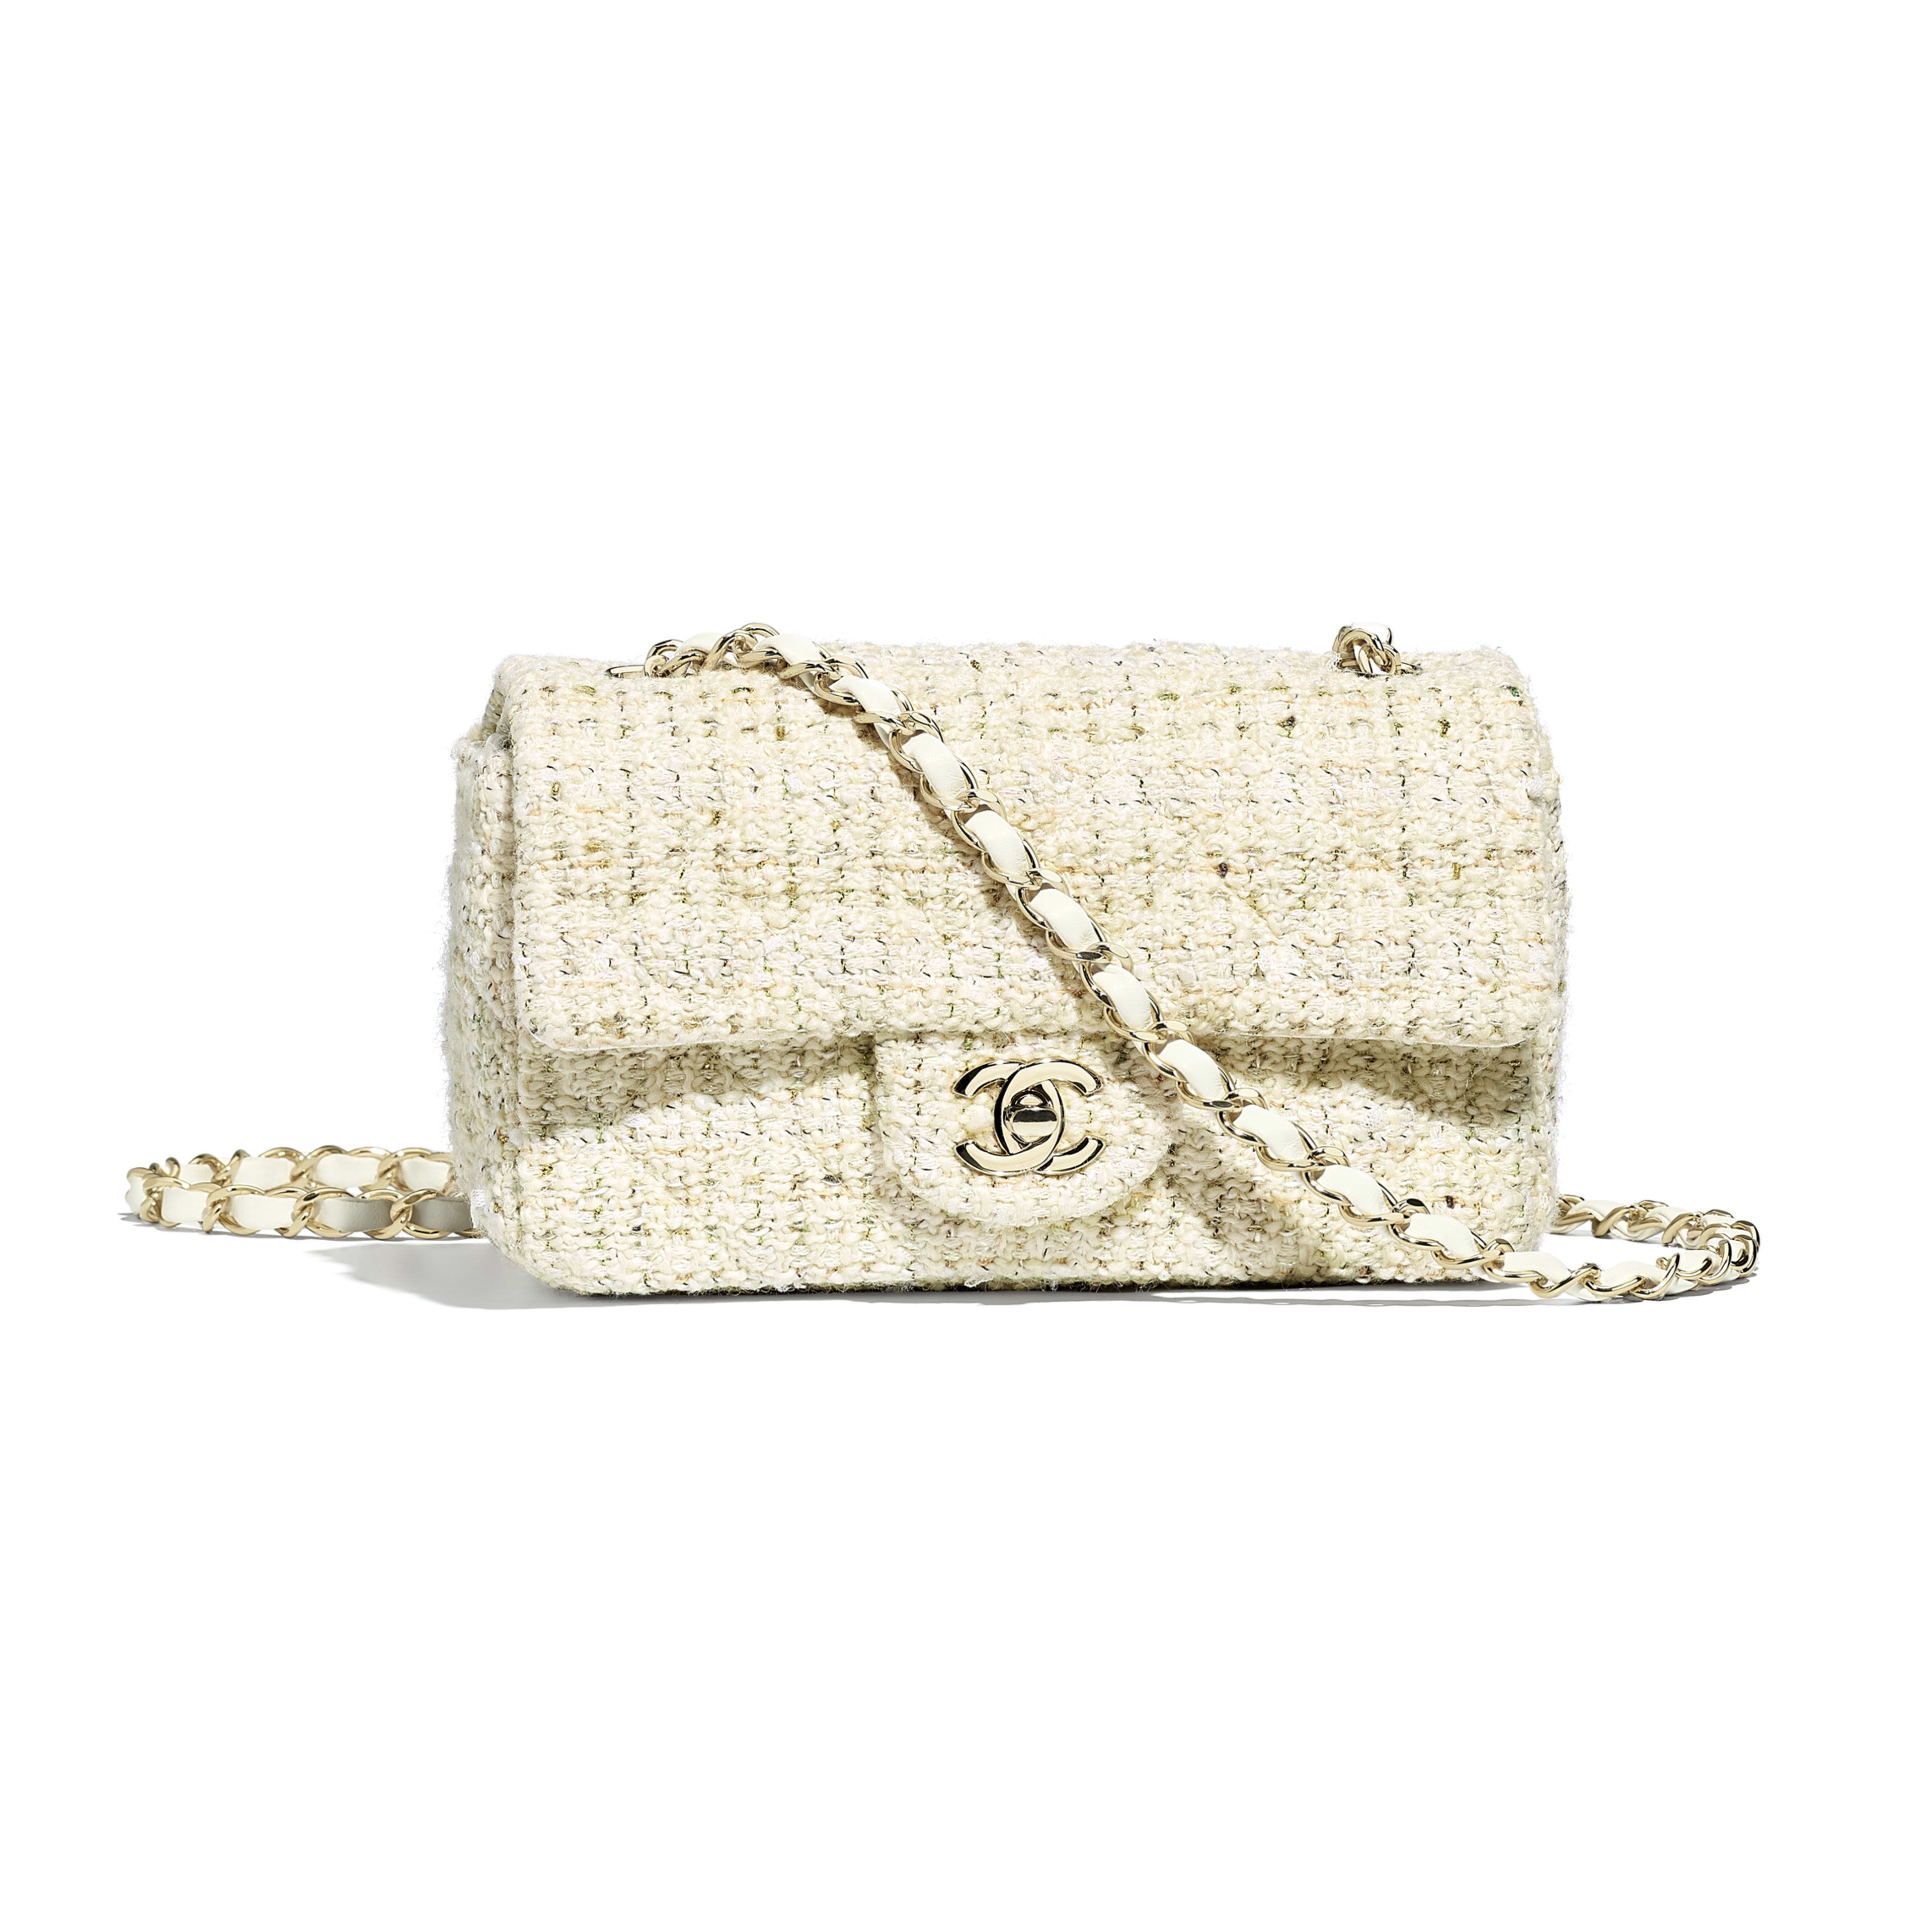 Mini Flap Bag - Ecru, white, green & gold - Tweed & Gold-Tone Metal - Default view - see full sized version